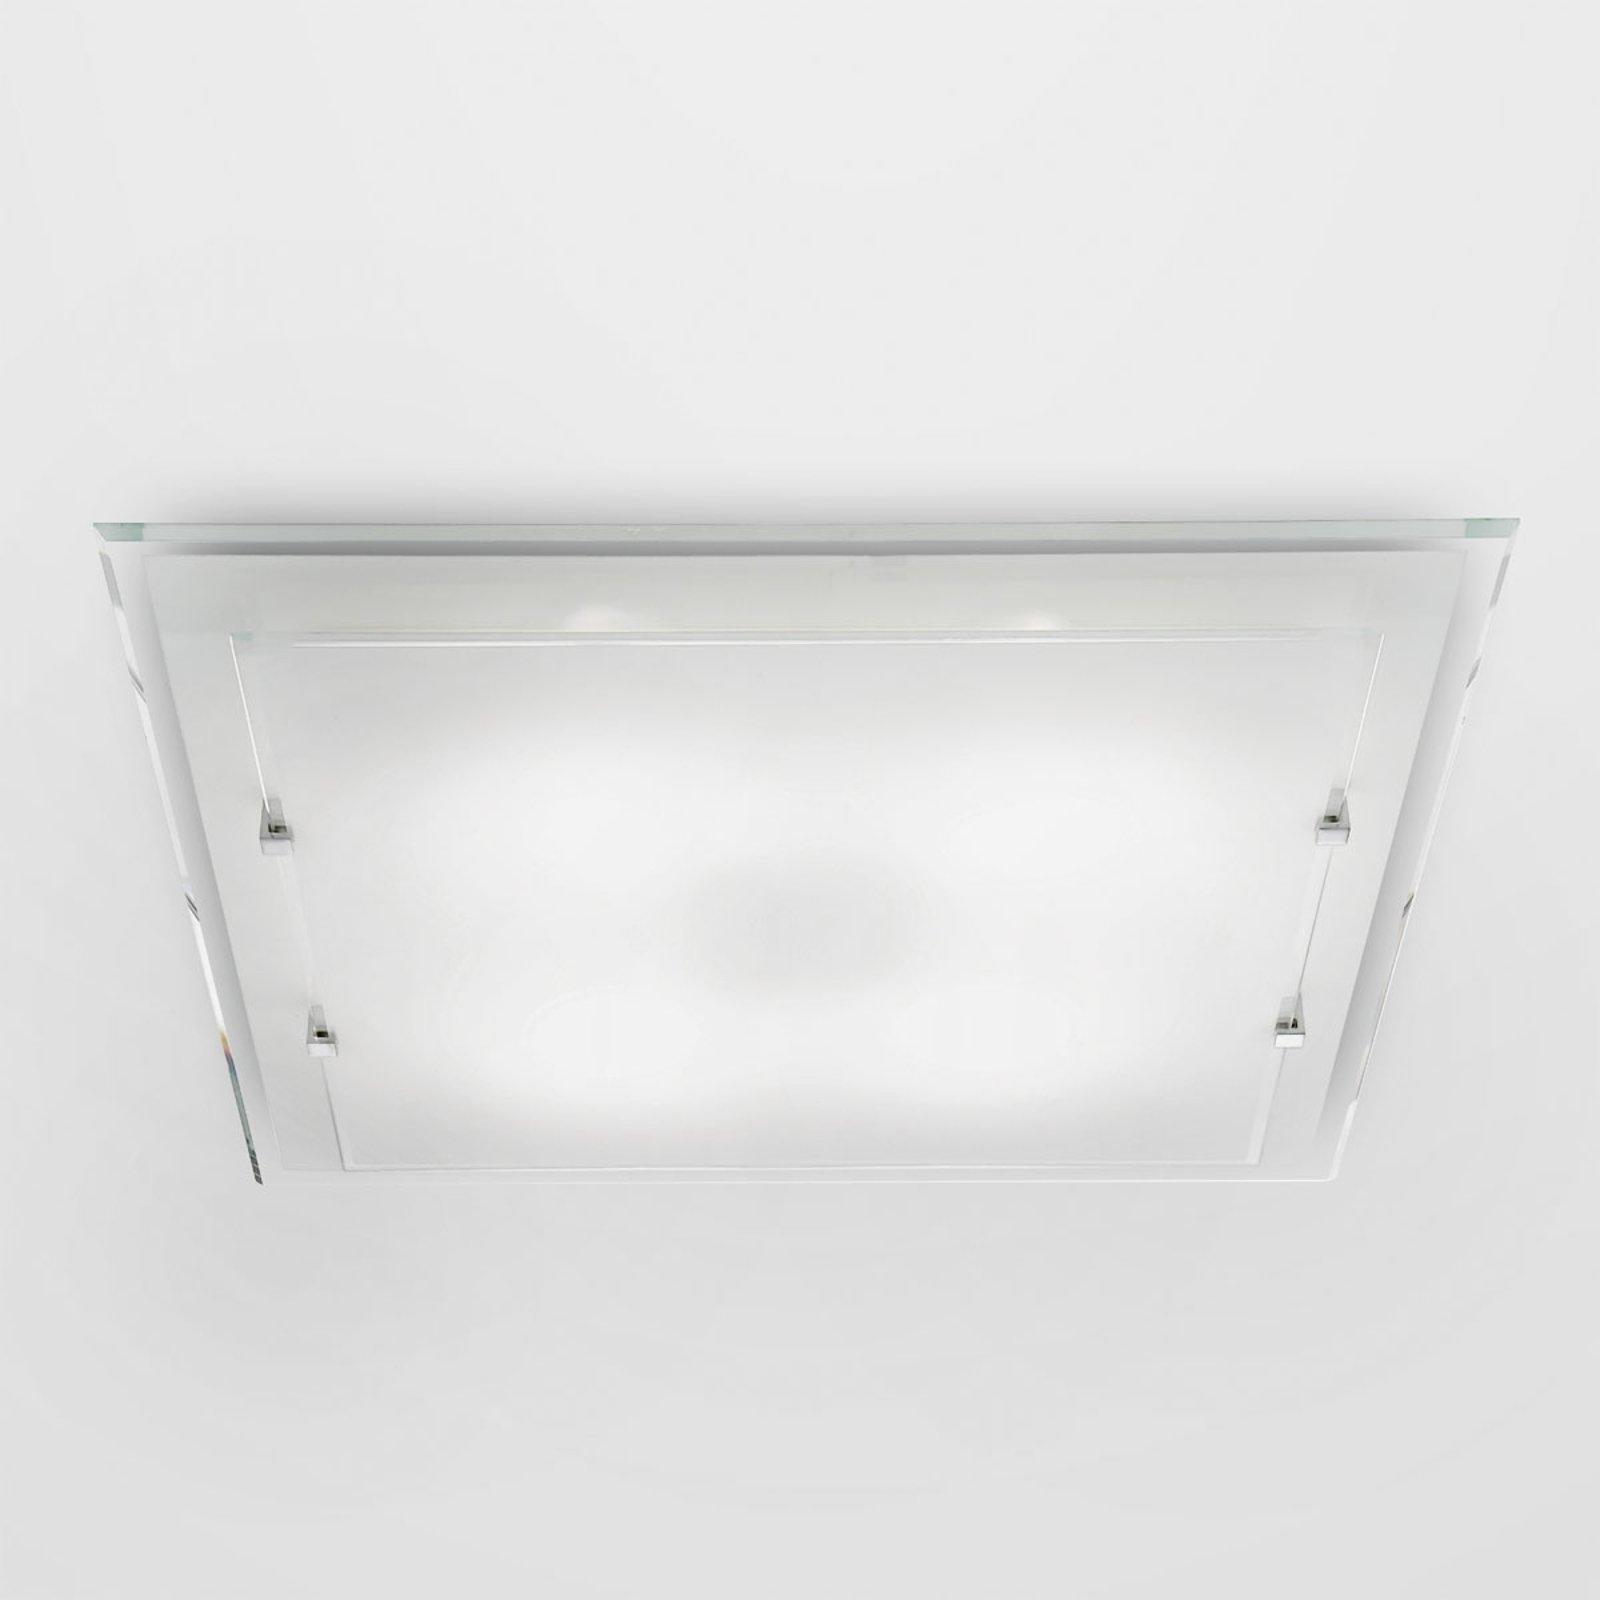 Kantet taklampe Victoria, 40 cm x 40 cm